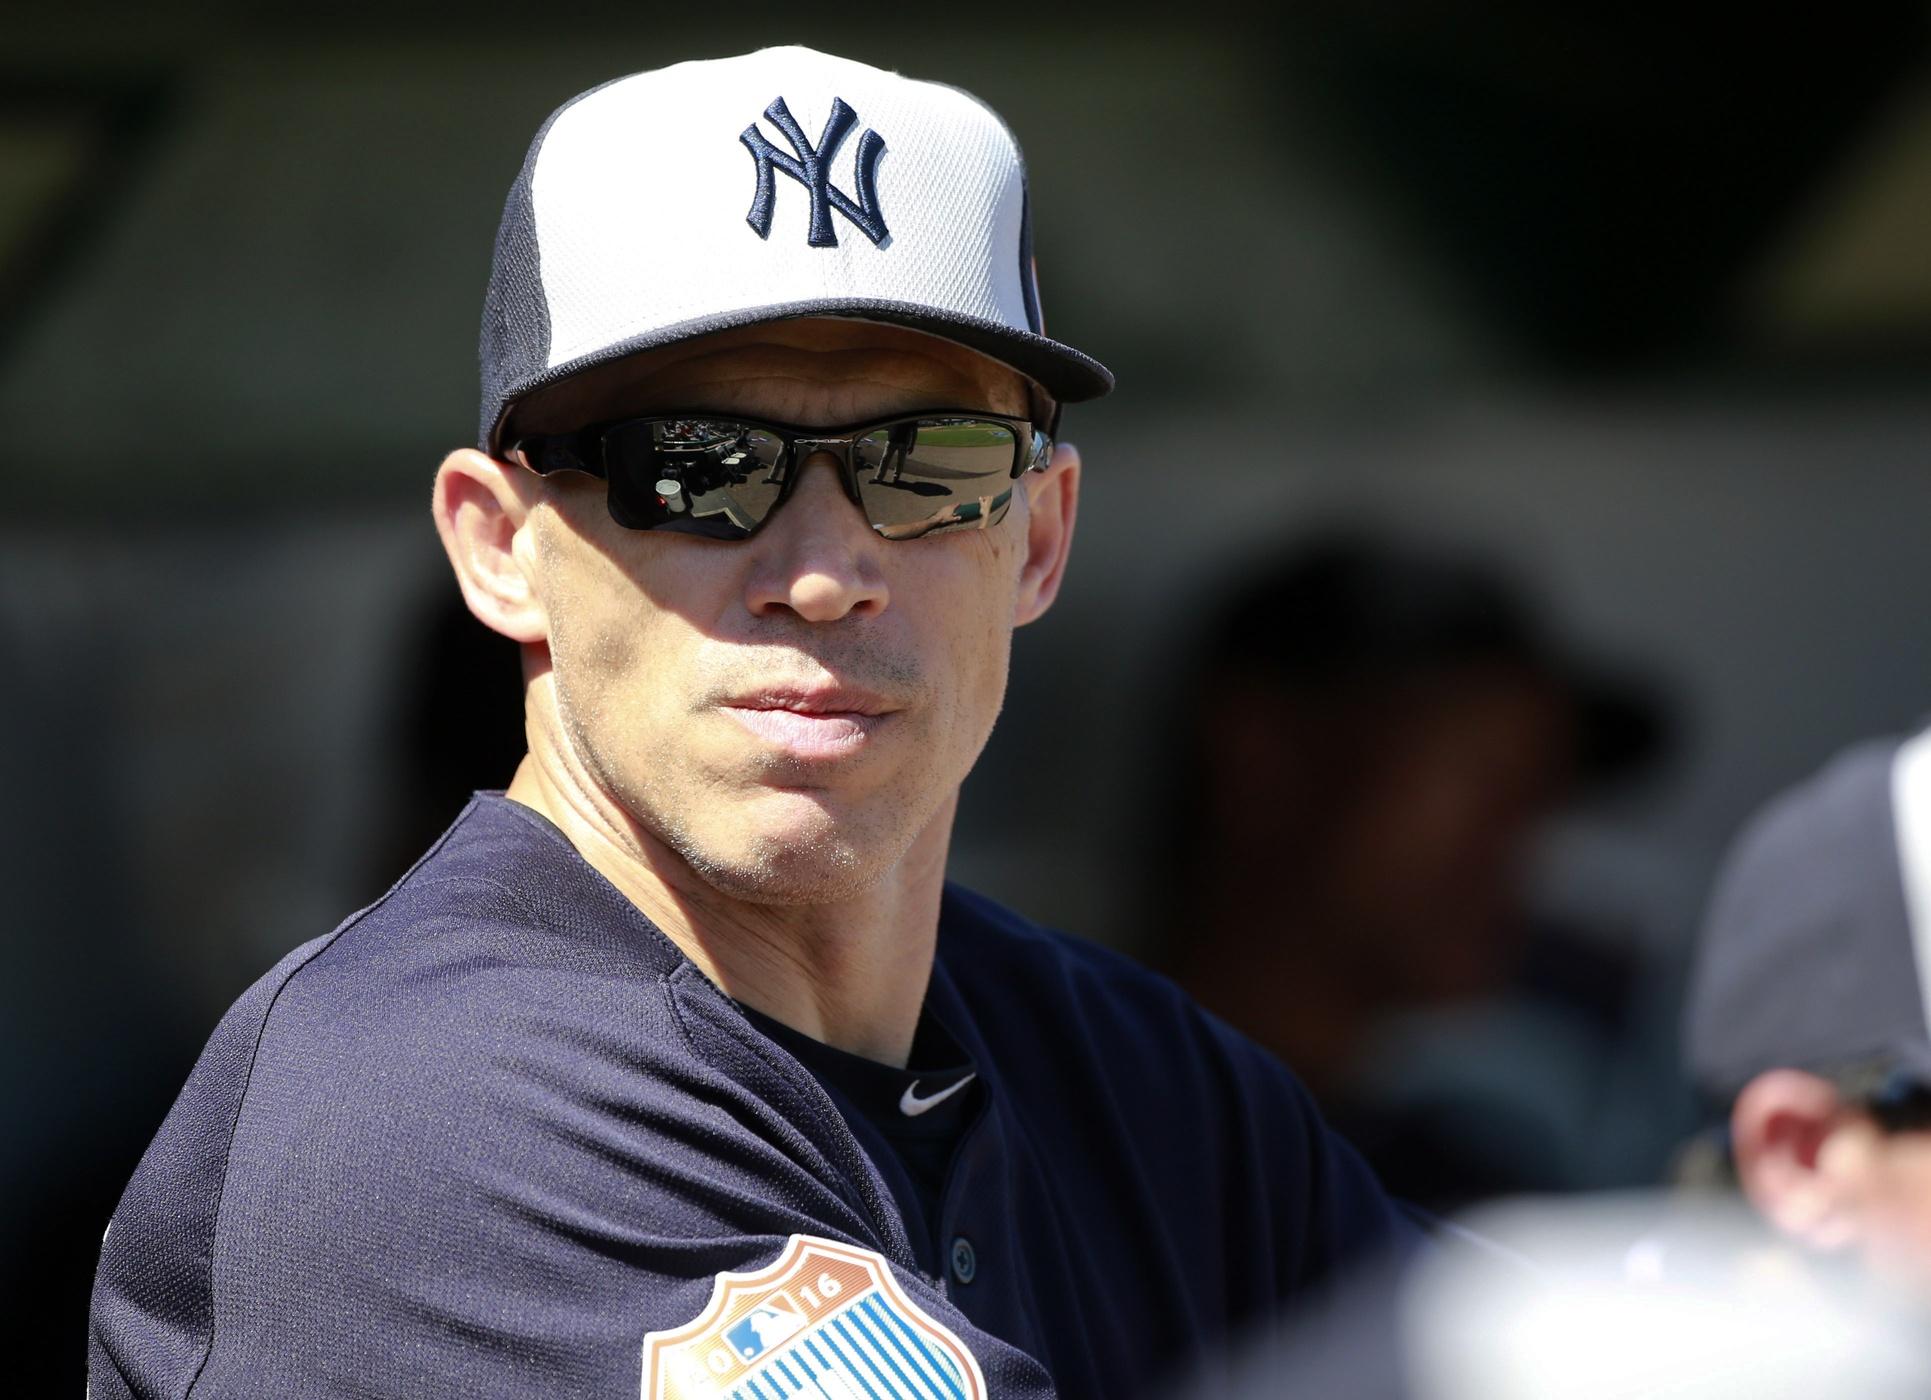 Joe Girardi New York Yankees